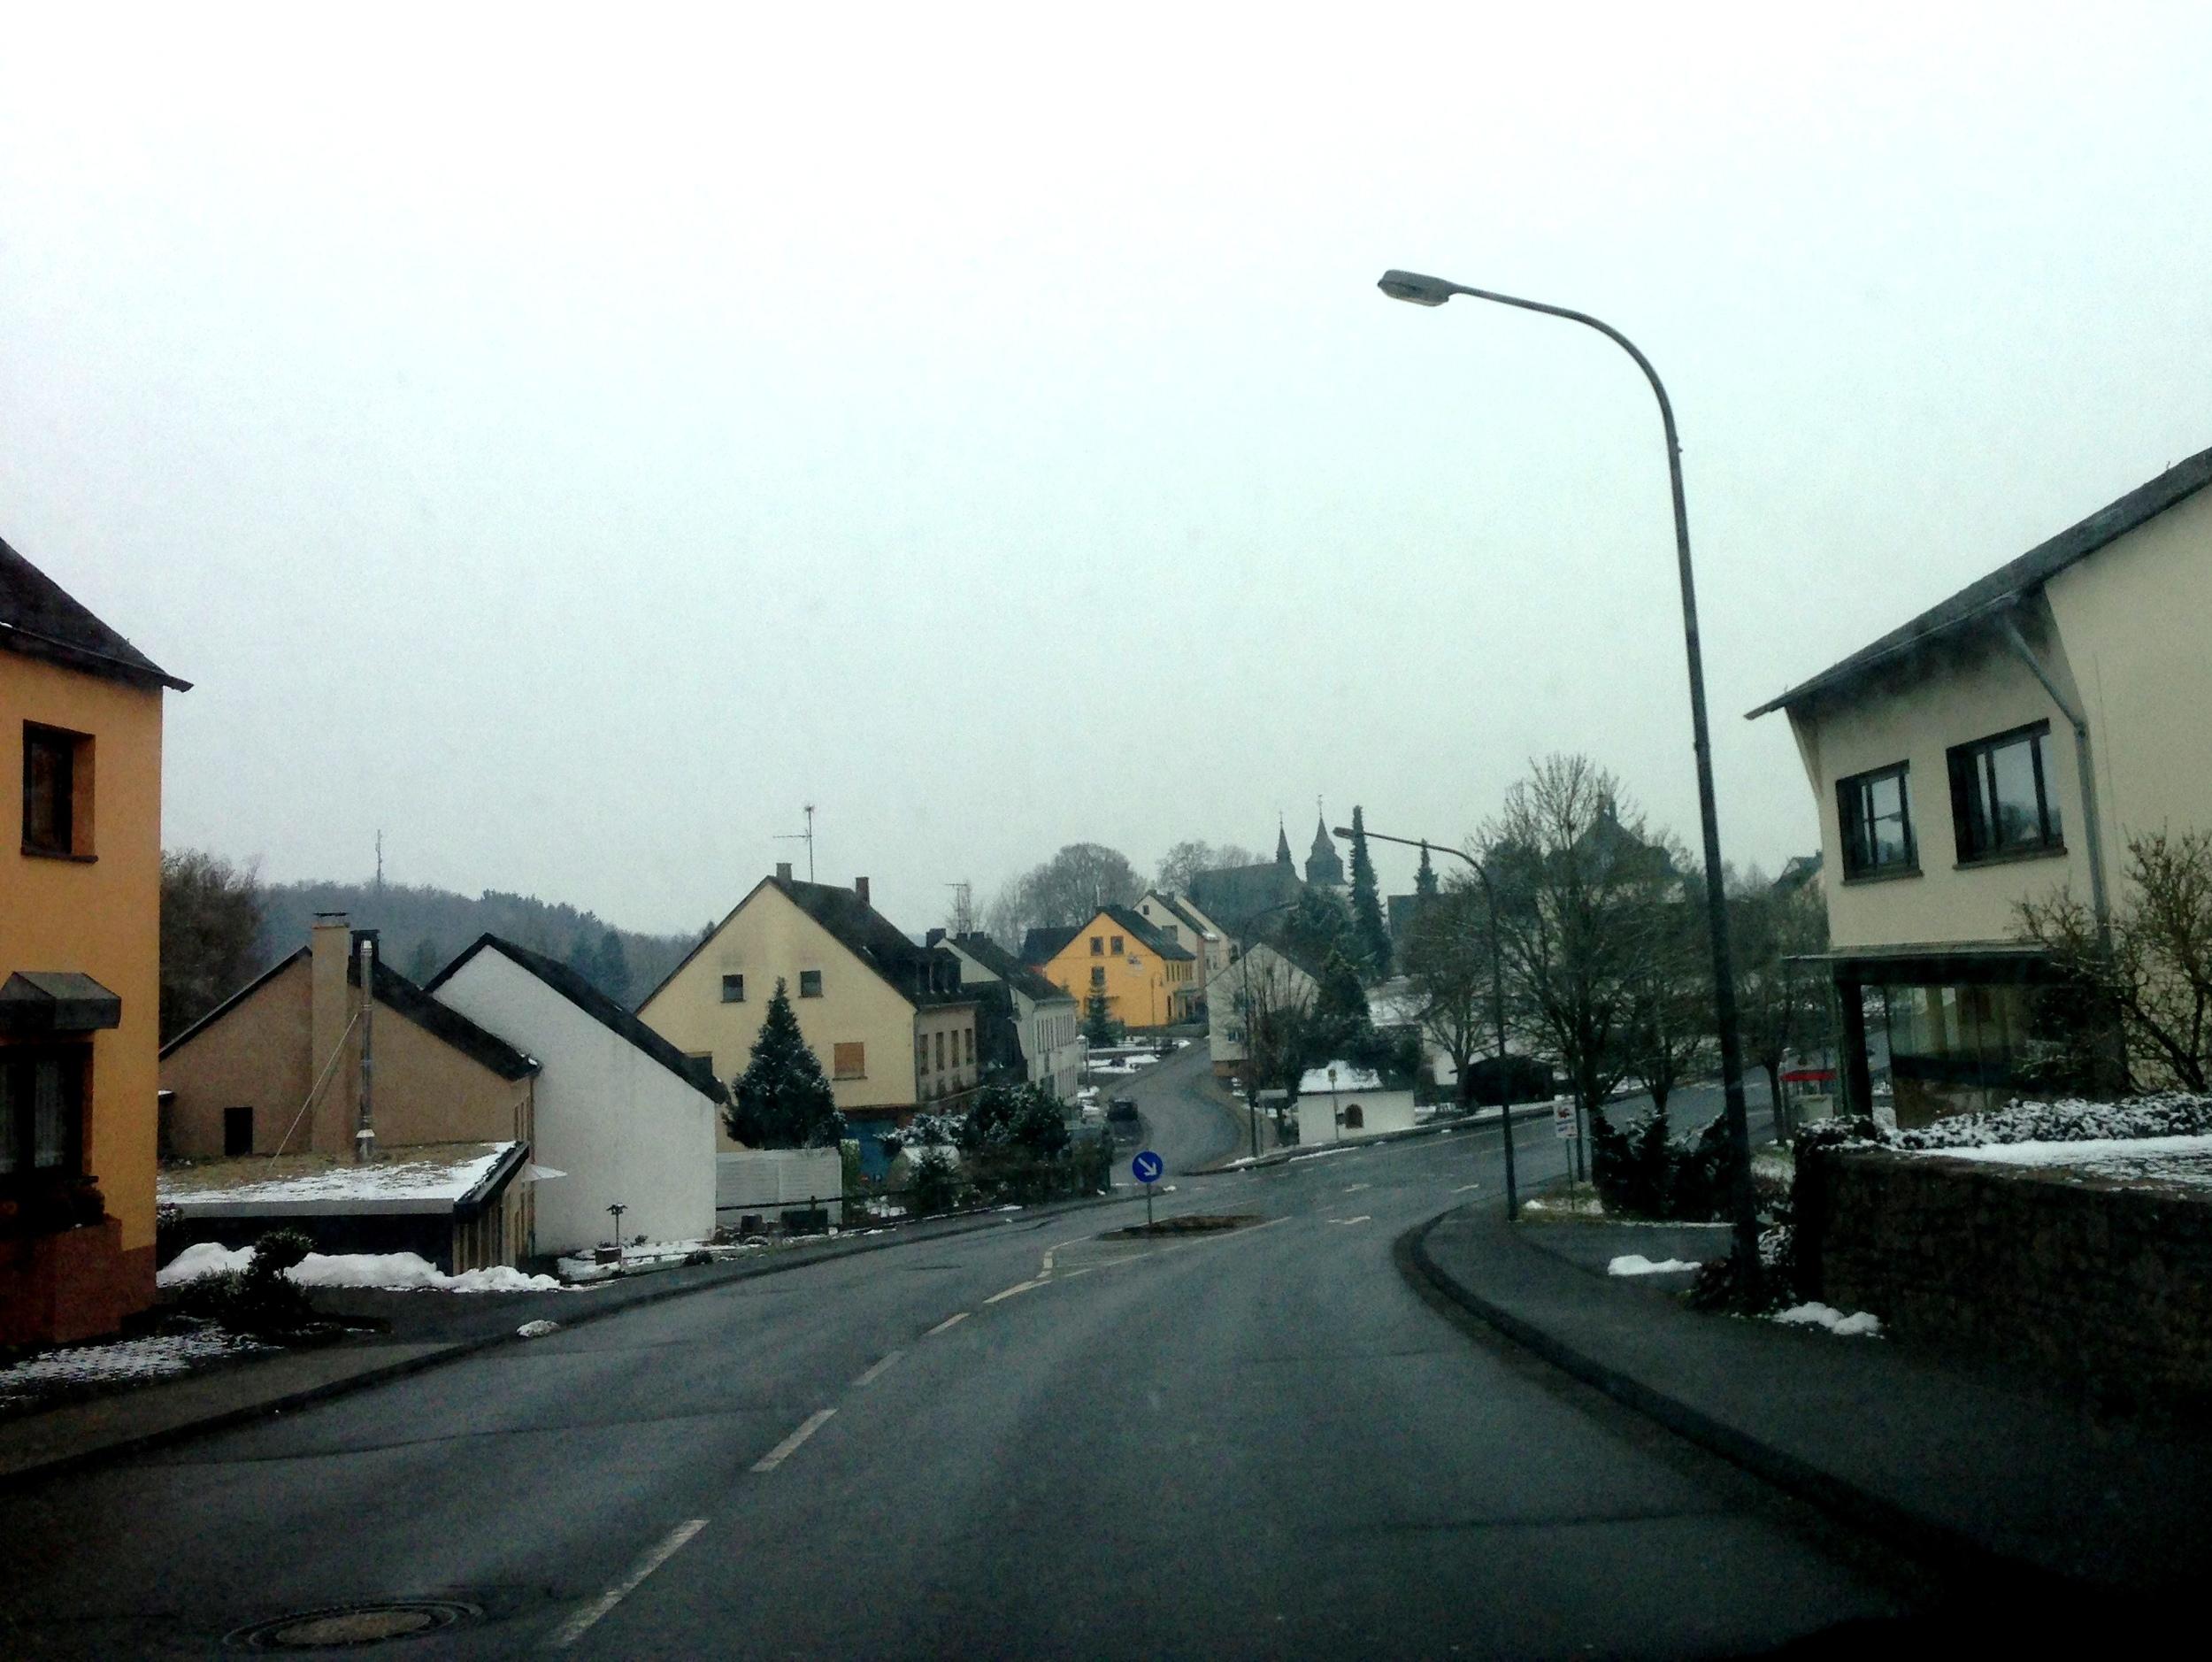 Arzfeld, Germany